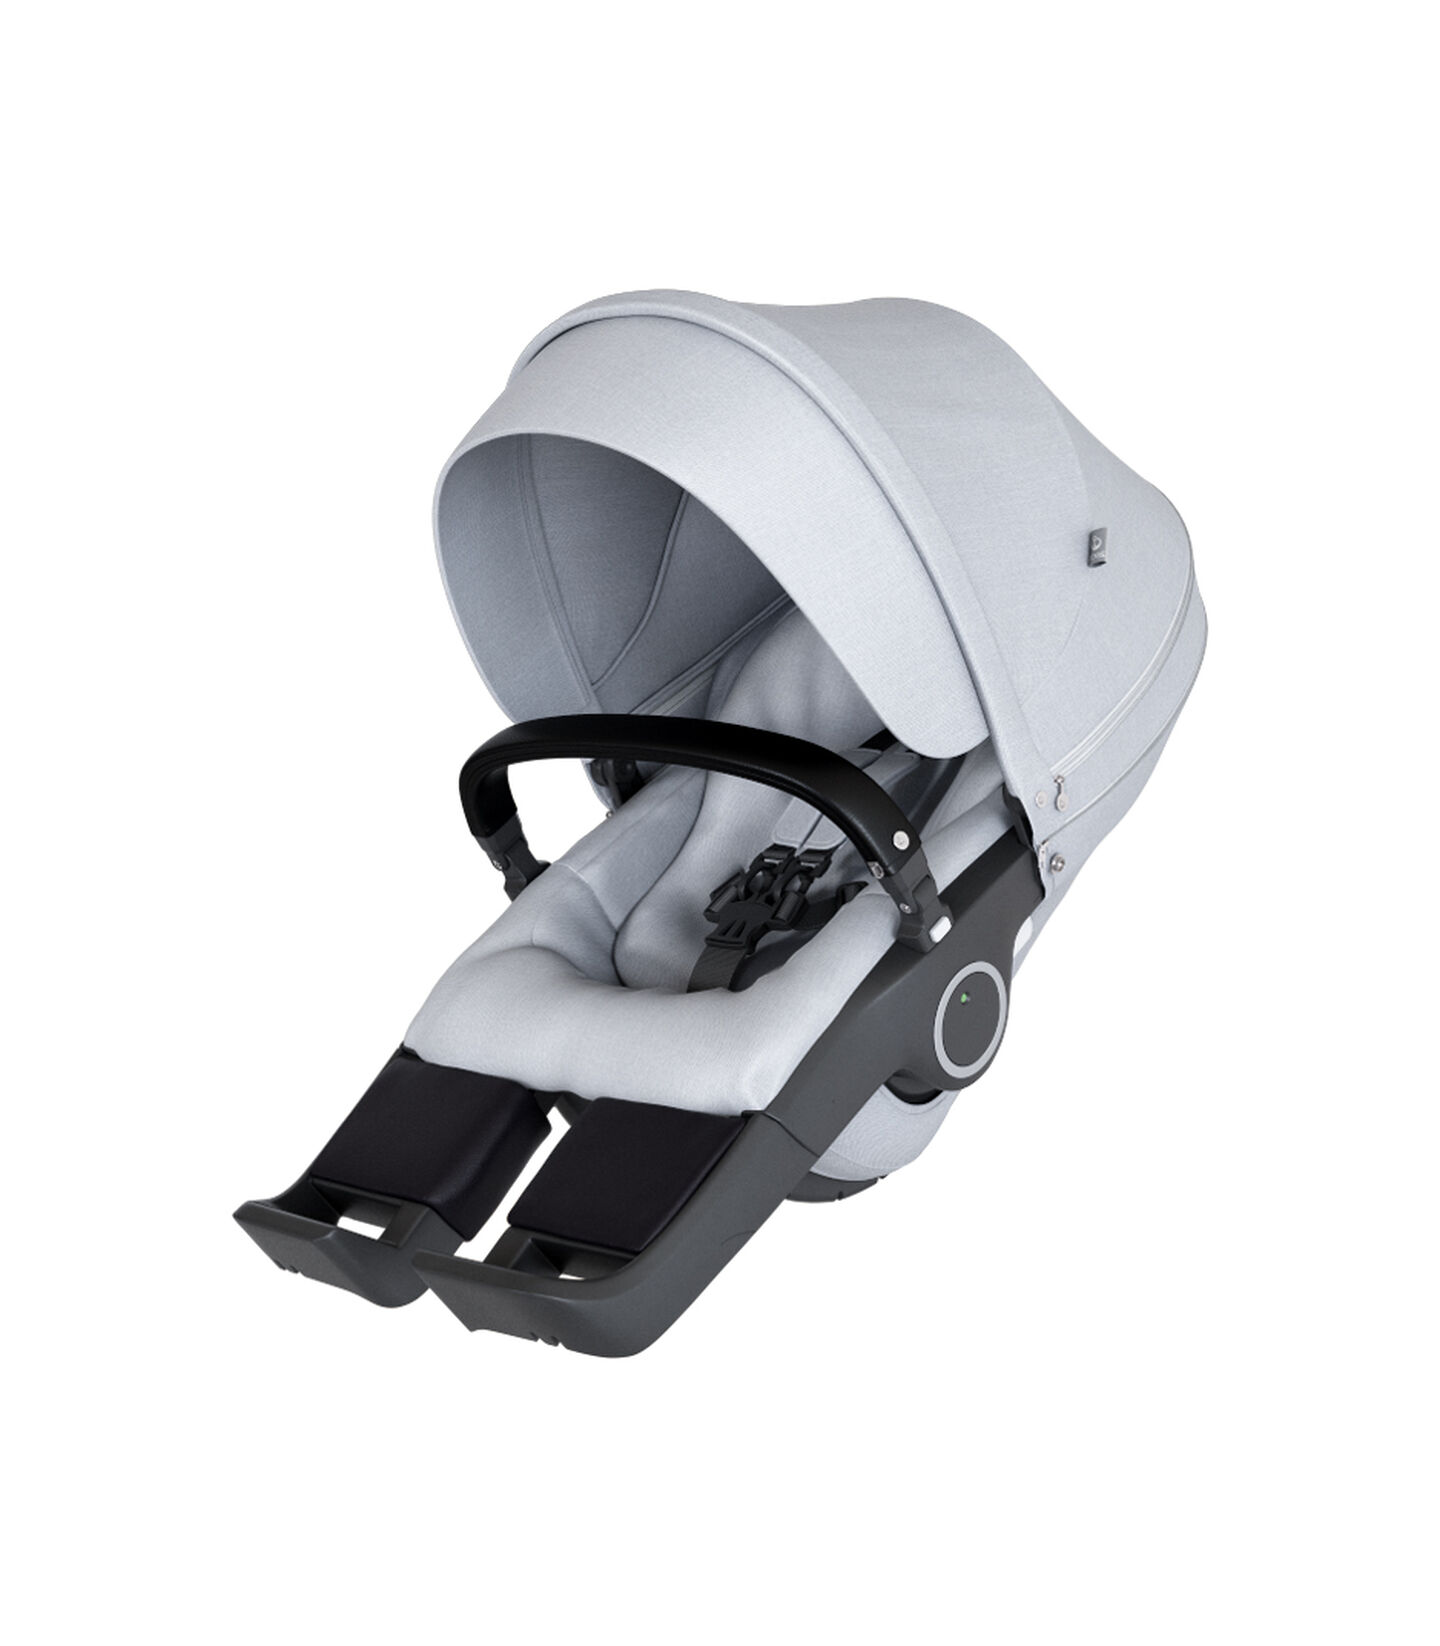 Stokke® Stroller Seat Grey Melange, Grey Melange, mainview view 2